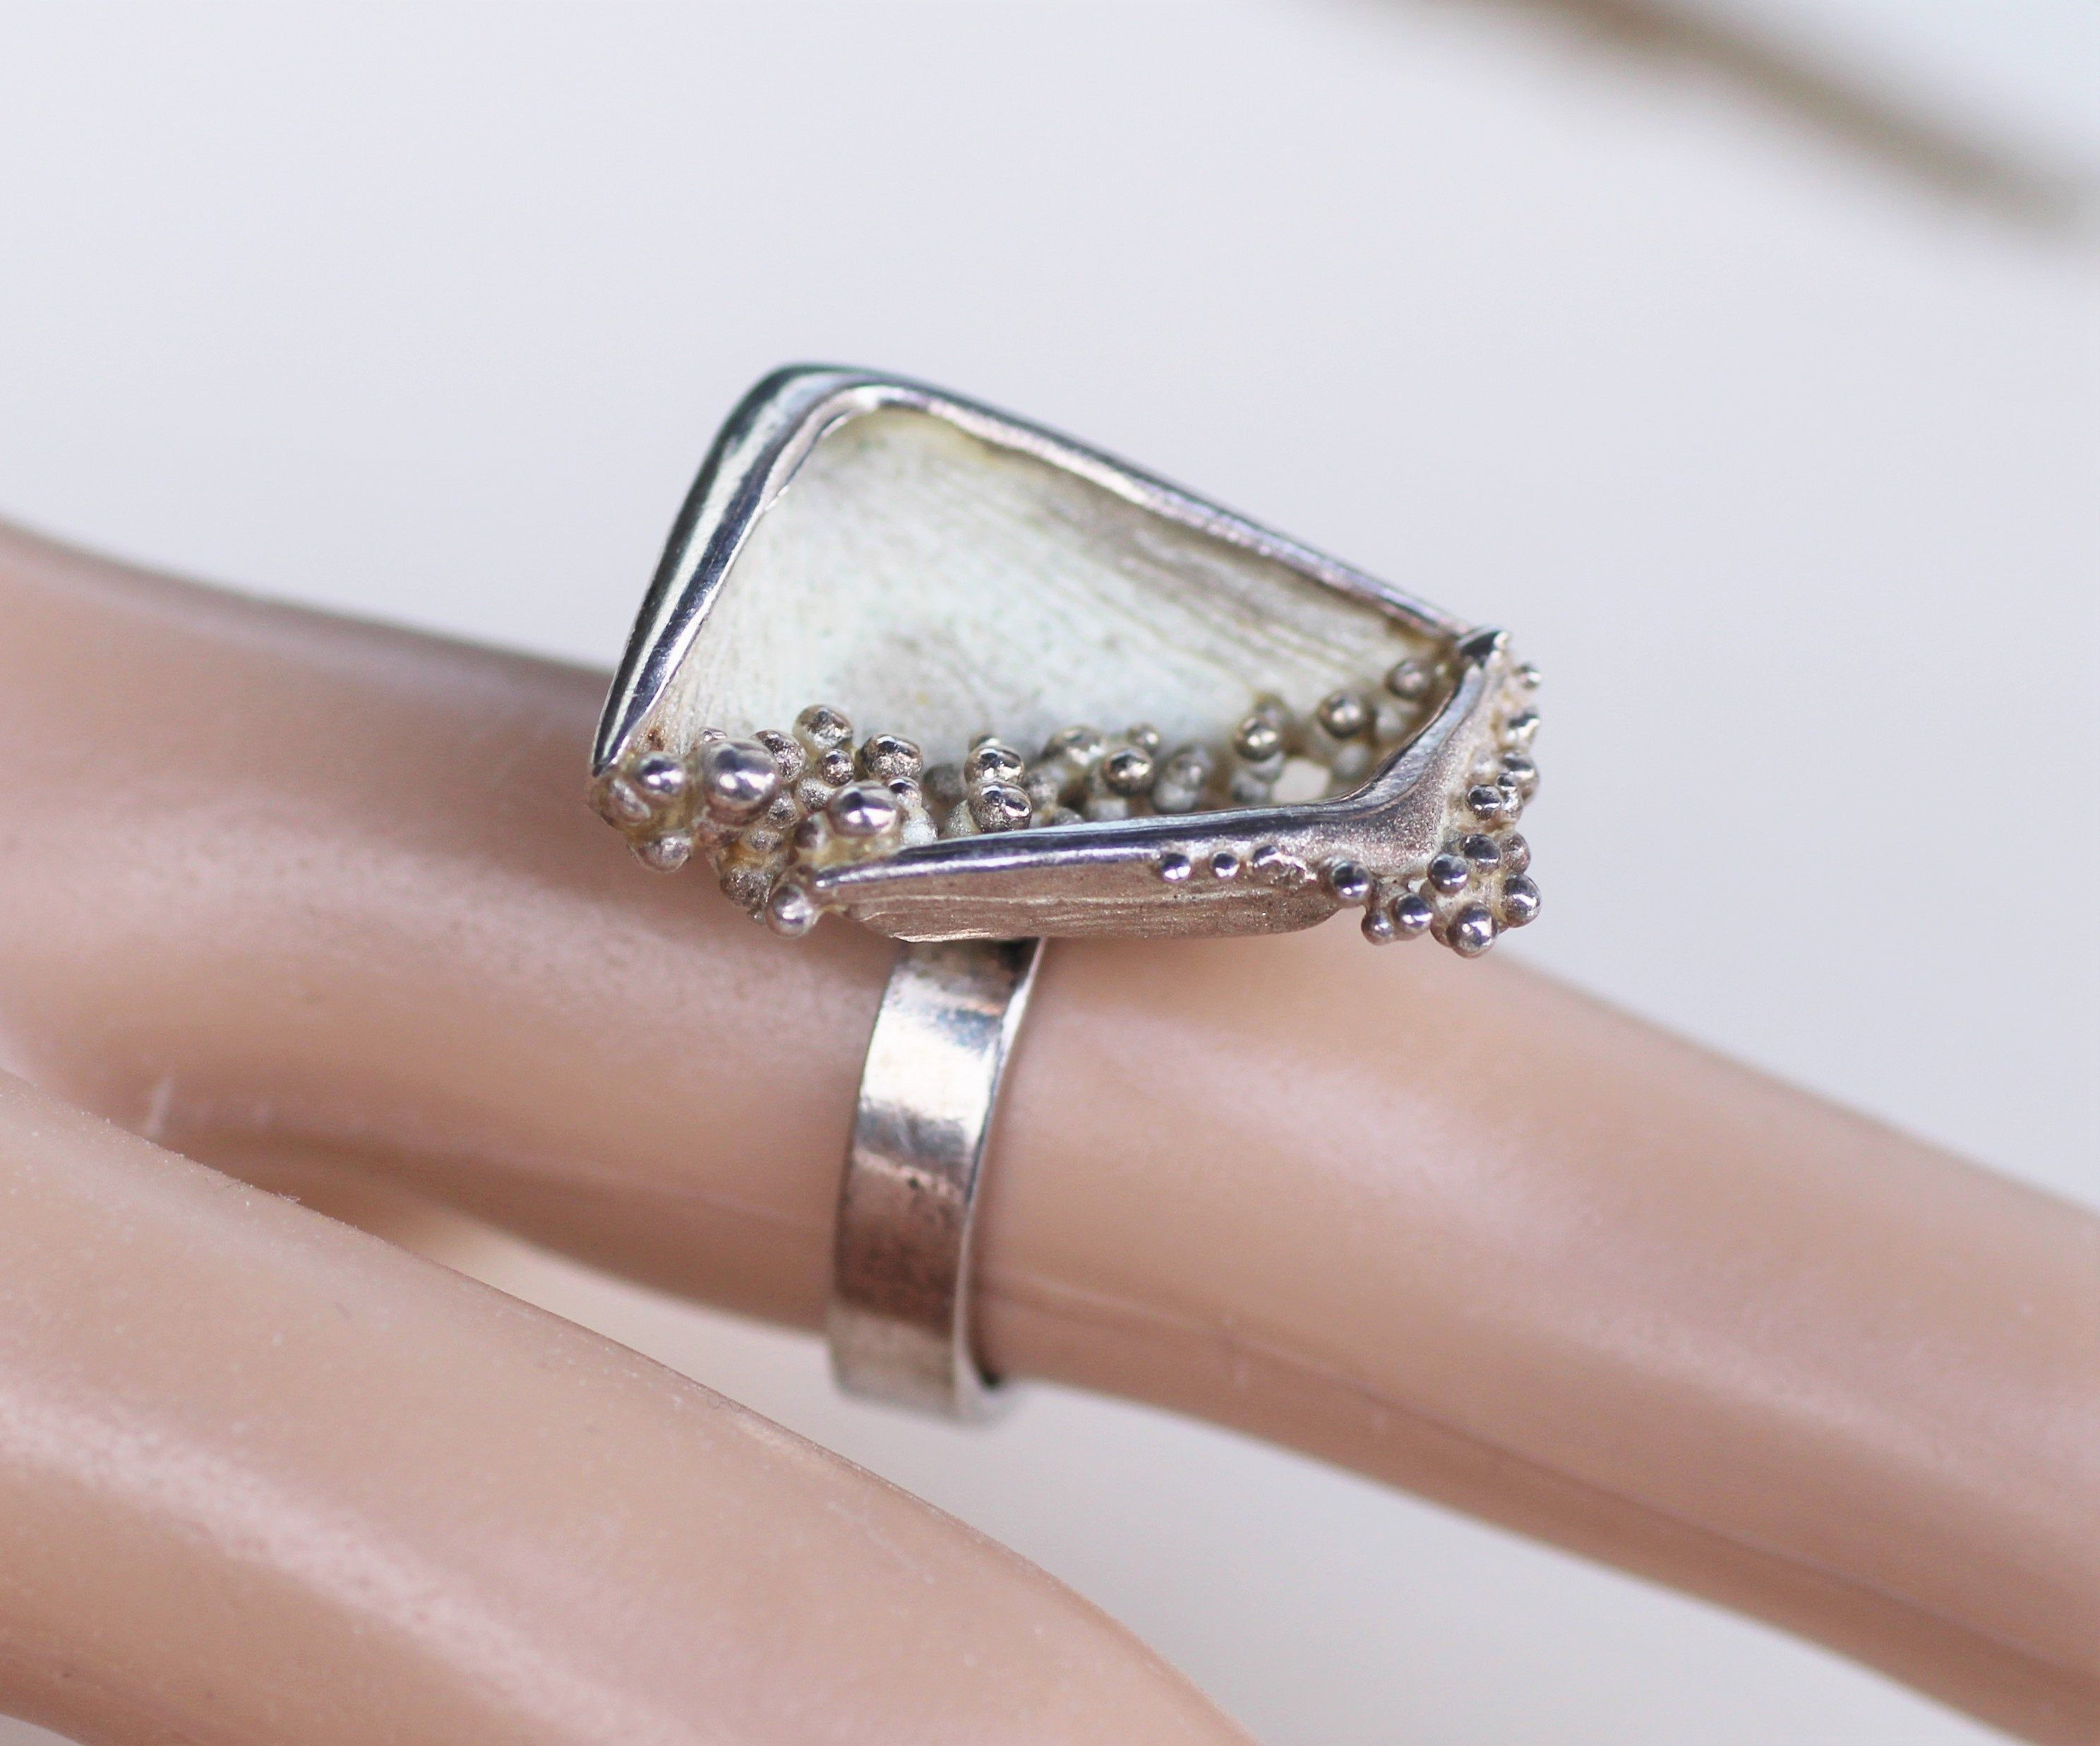 H C Ostrem Oxo Norway Vintage Scandinavian Norwegian Modernist Brutalist Organic Silver Sterling Ring In 2020 Jewelry Design Jewelry Sterling Silver Rings